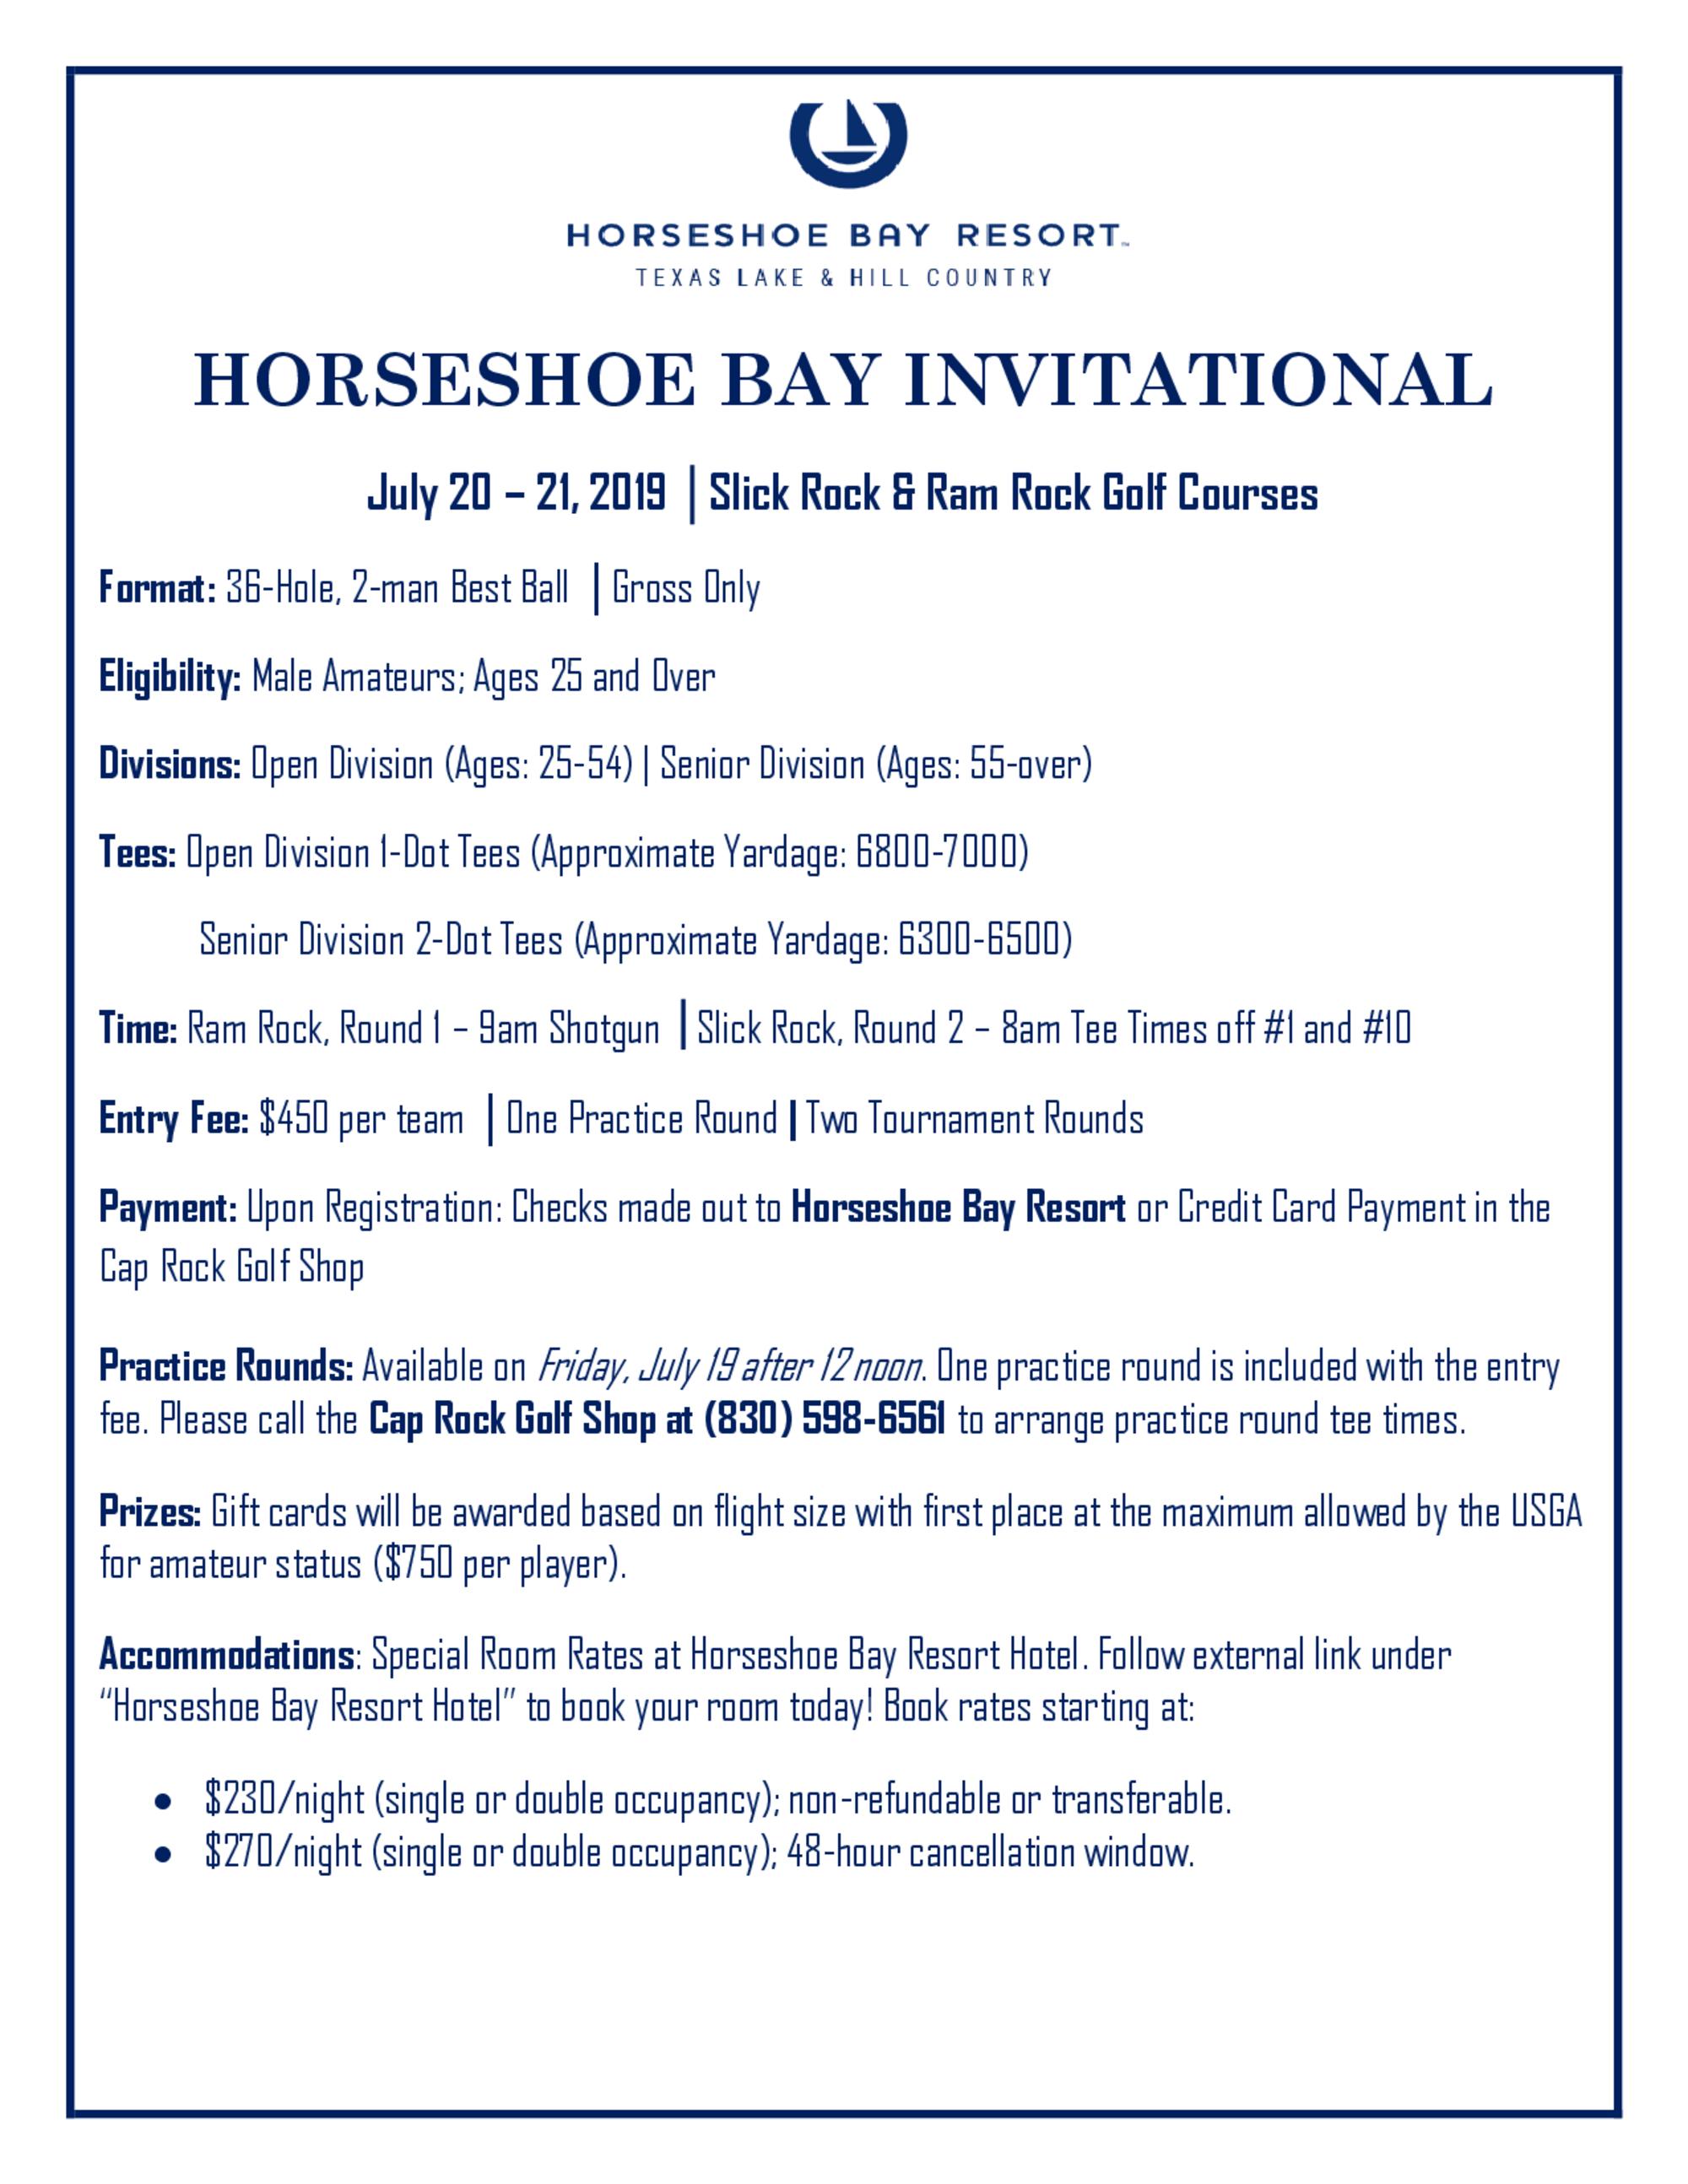 Hsb invitational more info 1